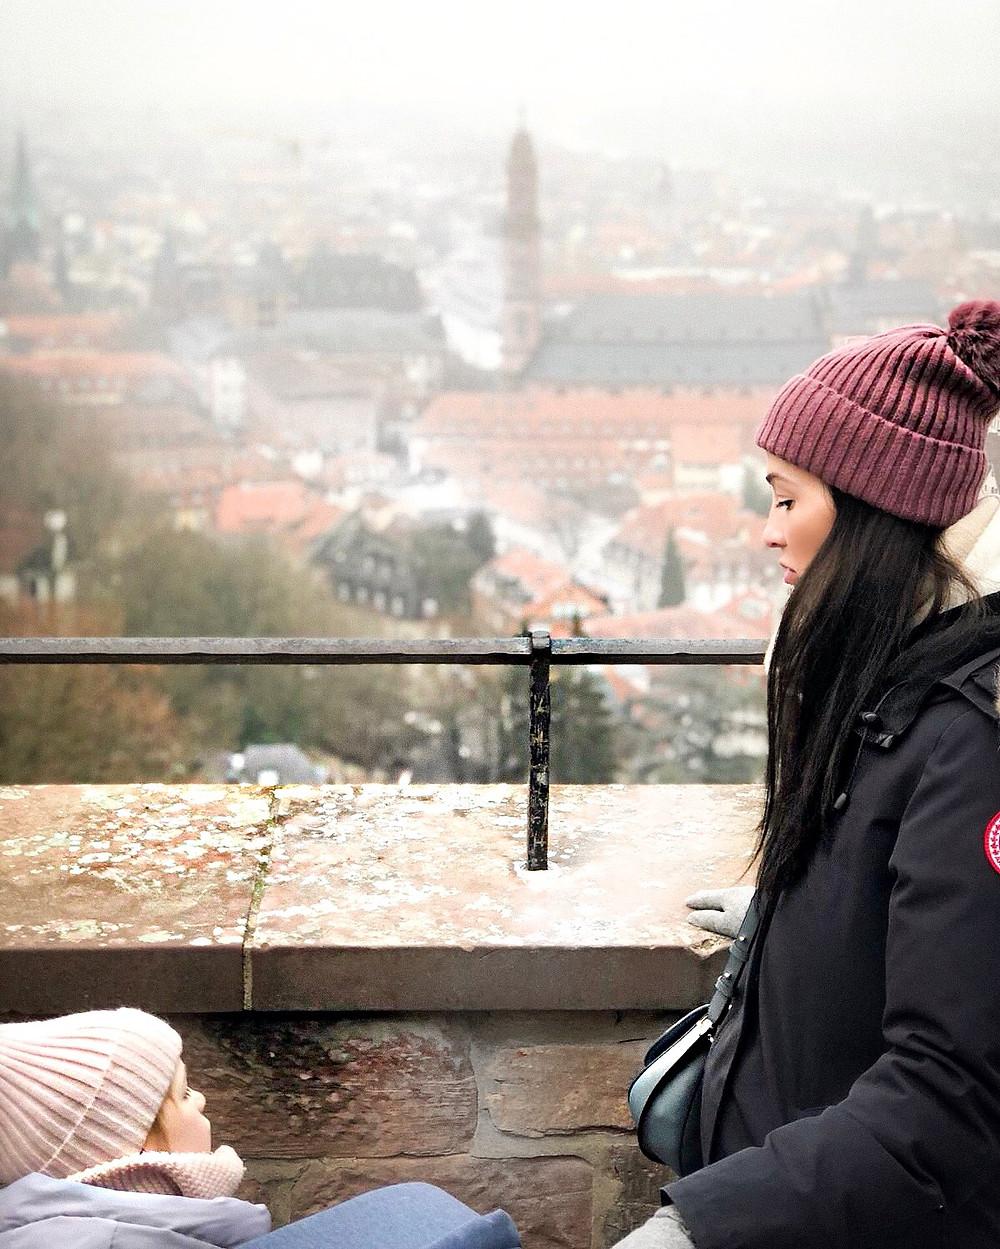 Papa und Tochter, Heidelberg Berlincityfam - Familienblog, Mamablog, Papablog Berlin